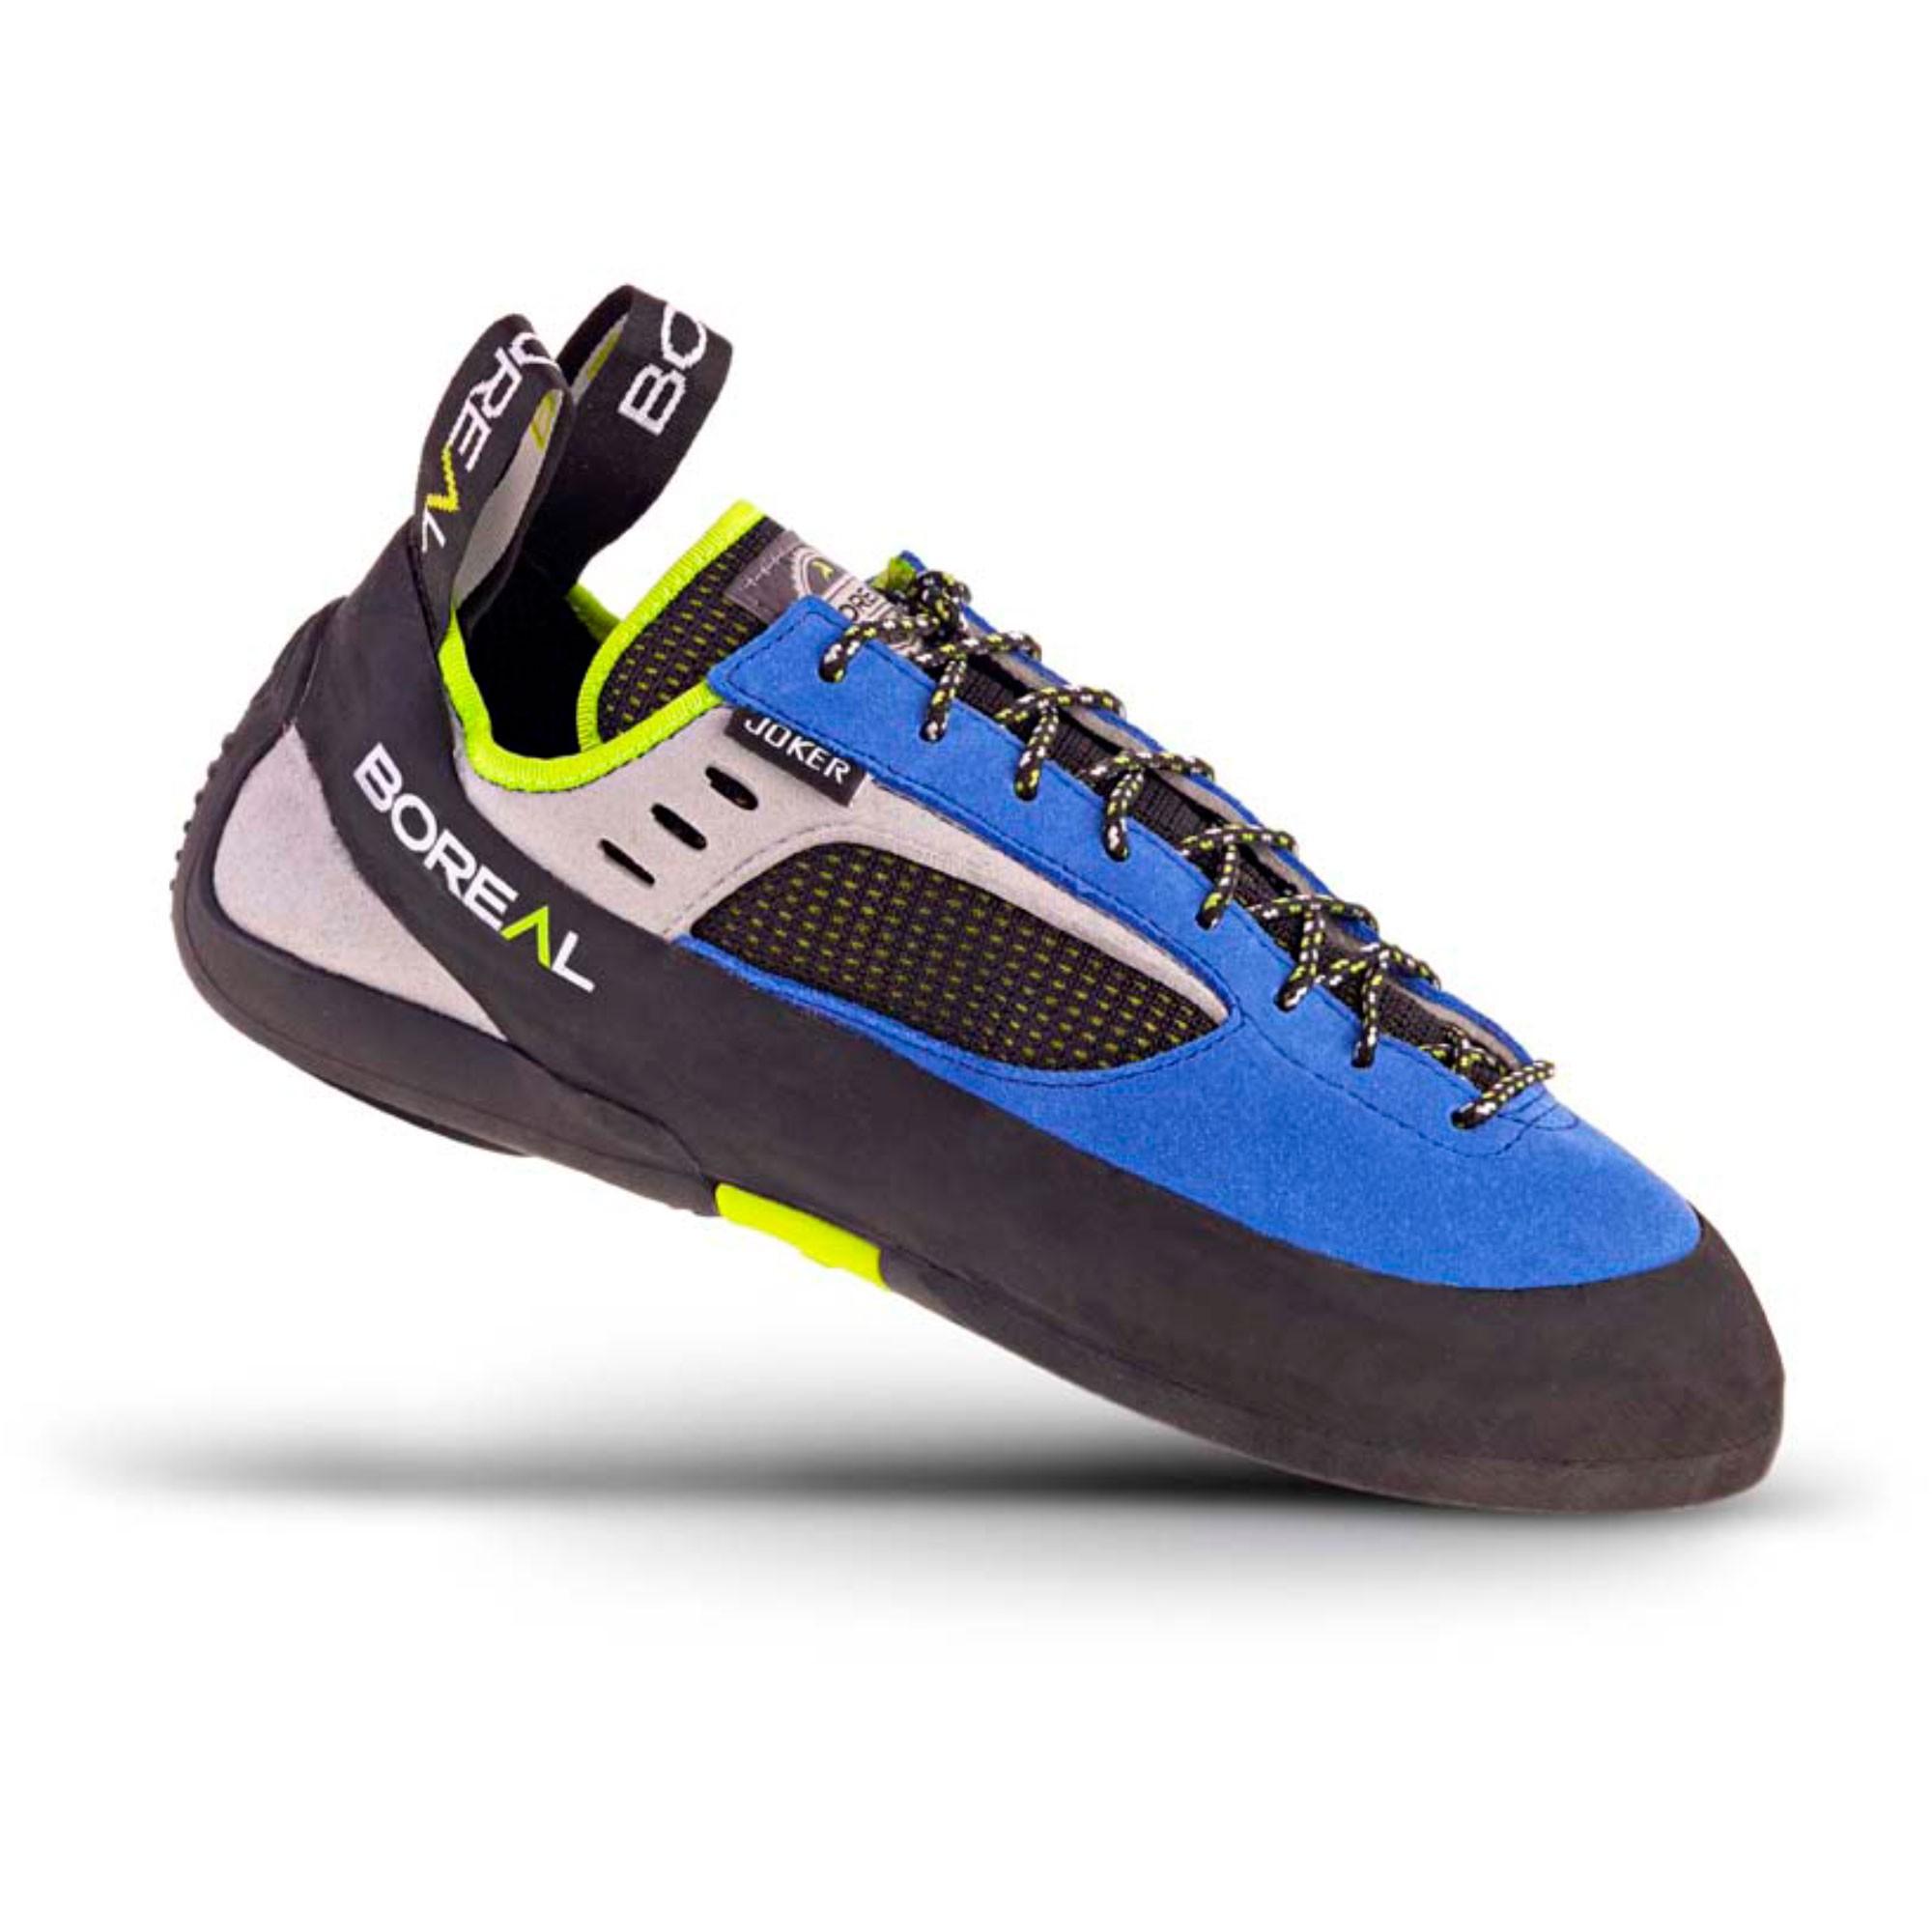 BOREAL - Joker Lace Climbing Shoes